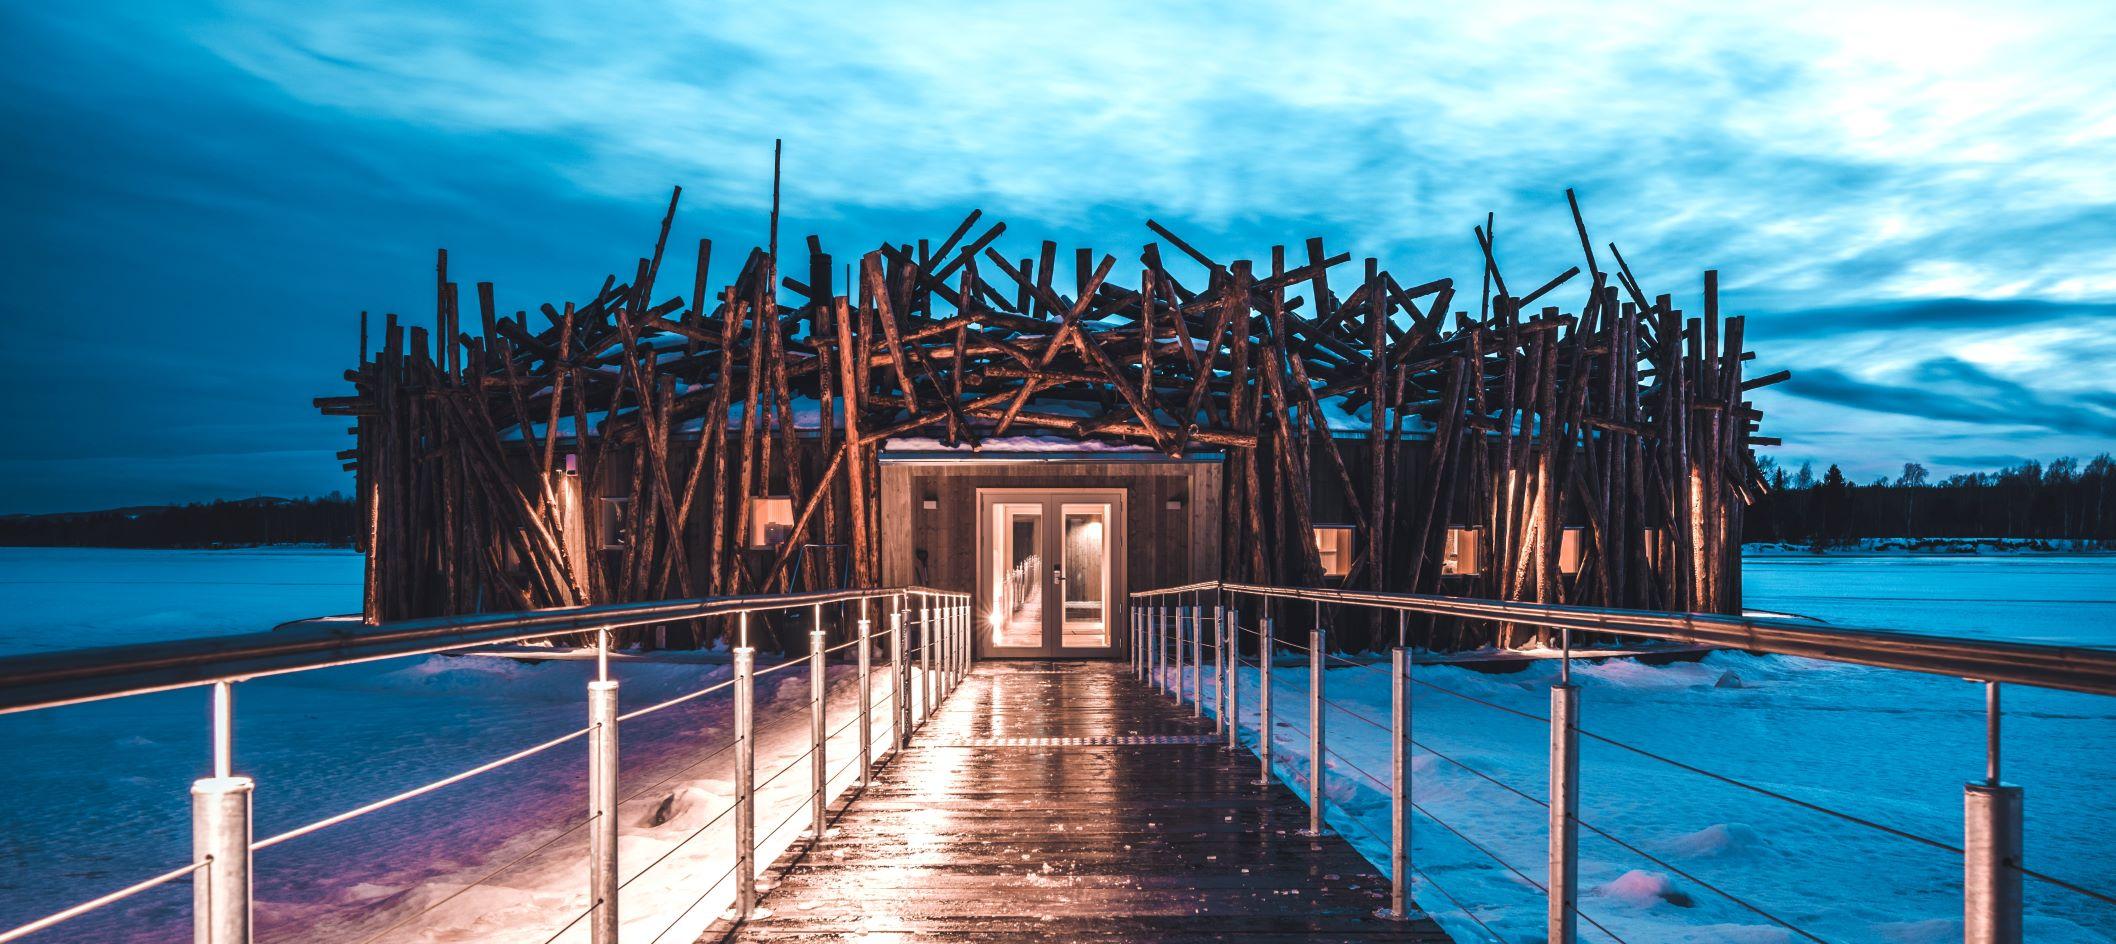 arctic-bath-hotel-exterior